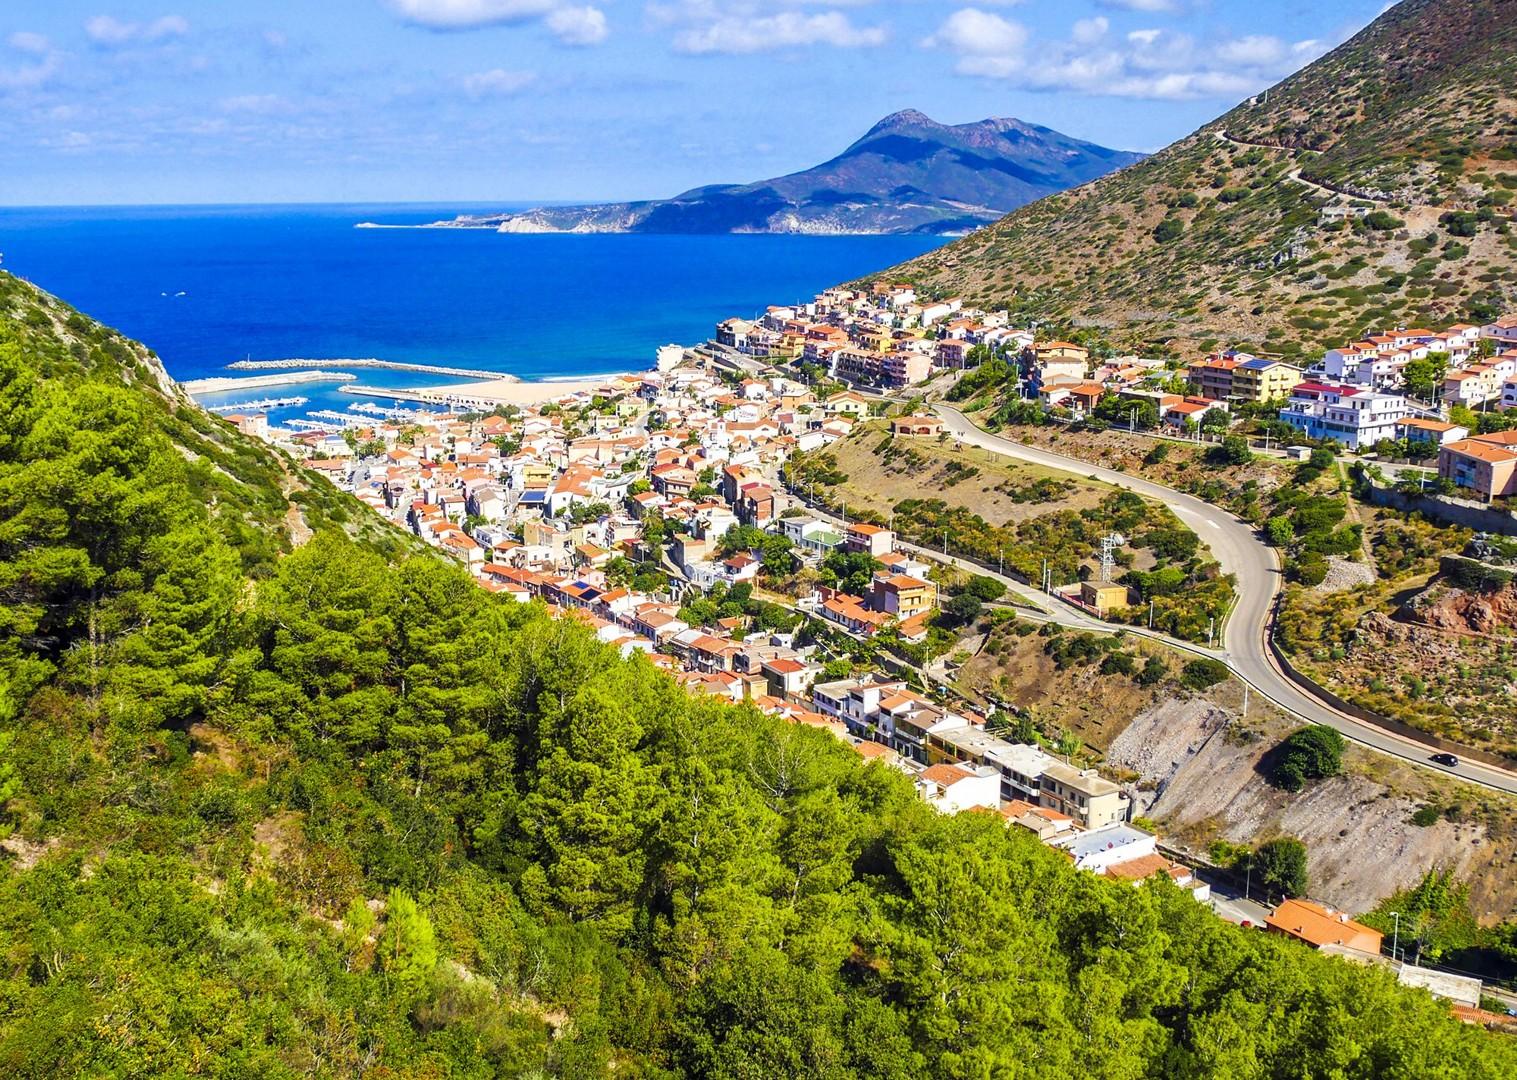 buggeru-sardinia-italy-leisure-cycling-holiday-guided.jpg - Italy - Sardinia - Island Flavours - Guided Leisure Cycling Holiday - Italia Leisure and Family Cycling